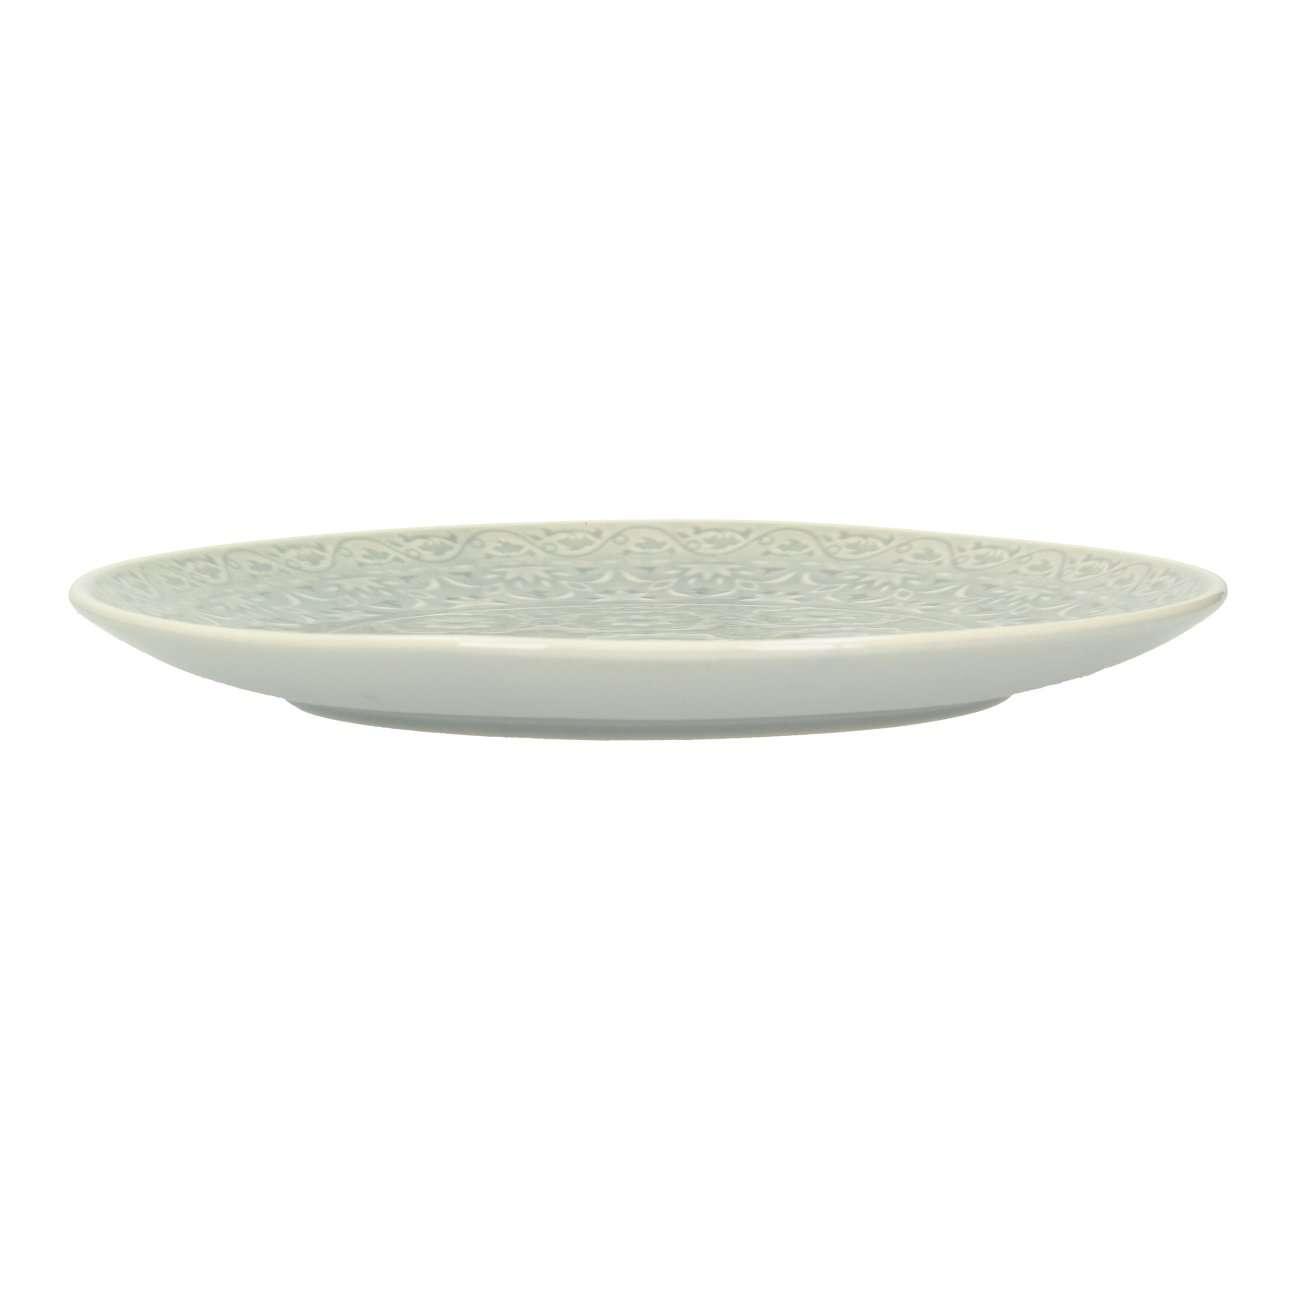 Teller Grey Stone 27cm